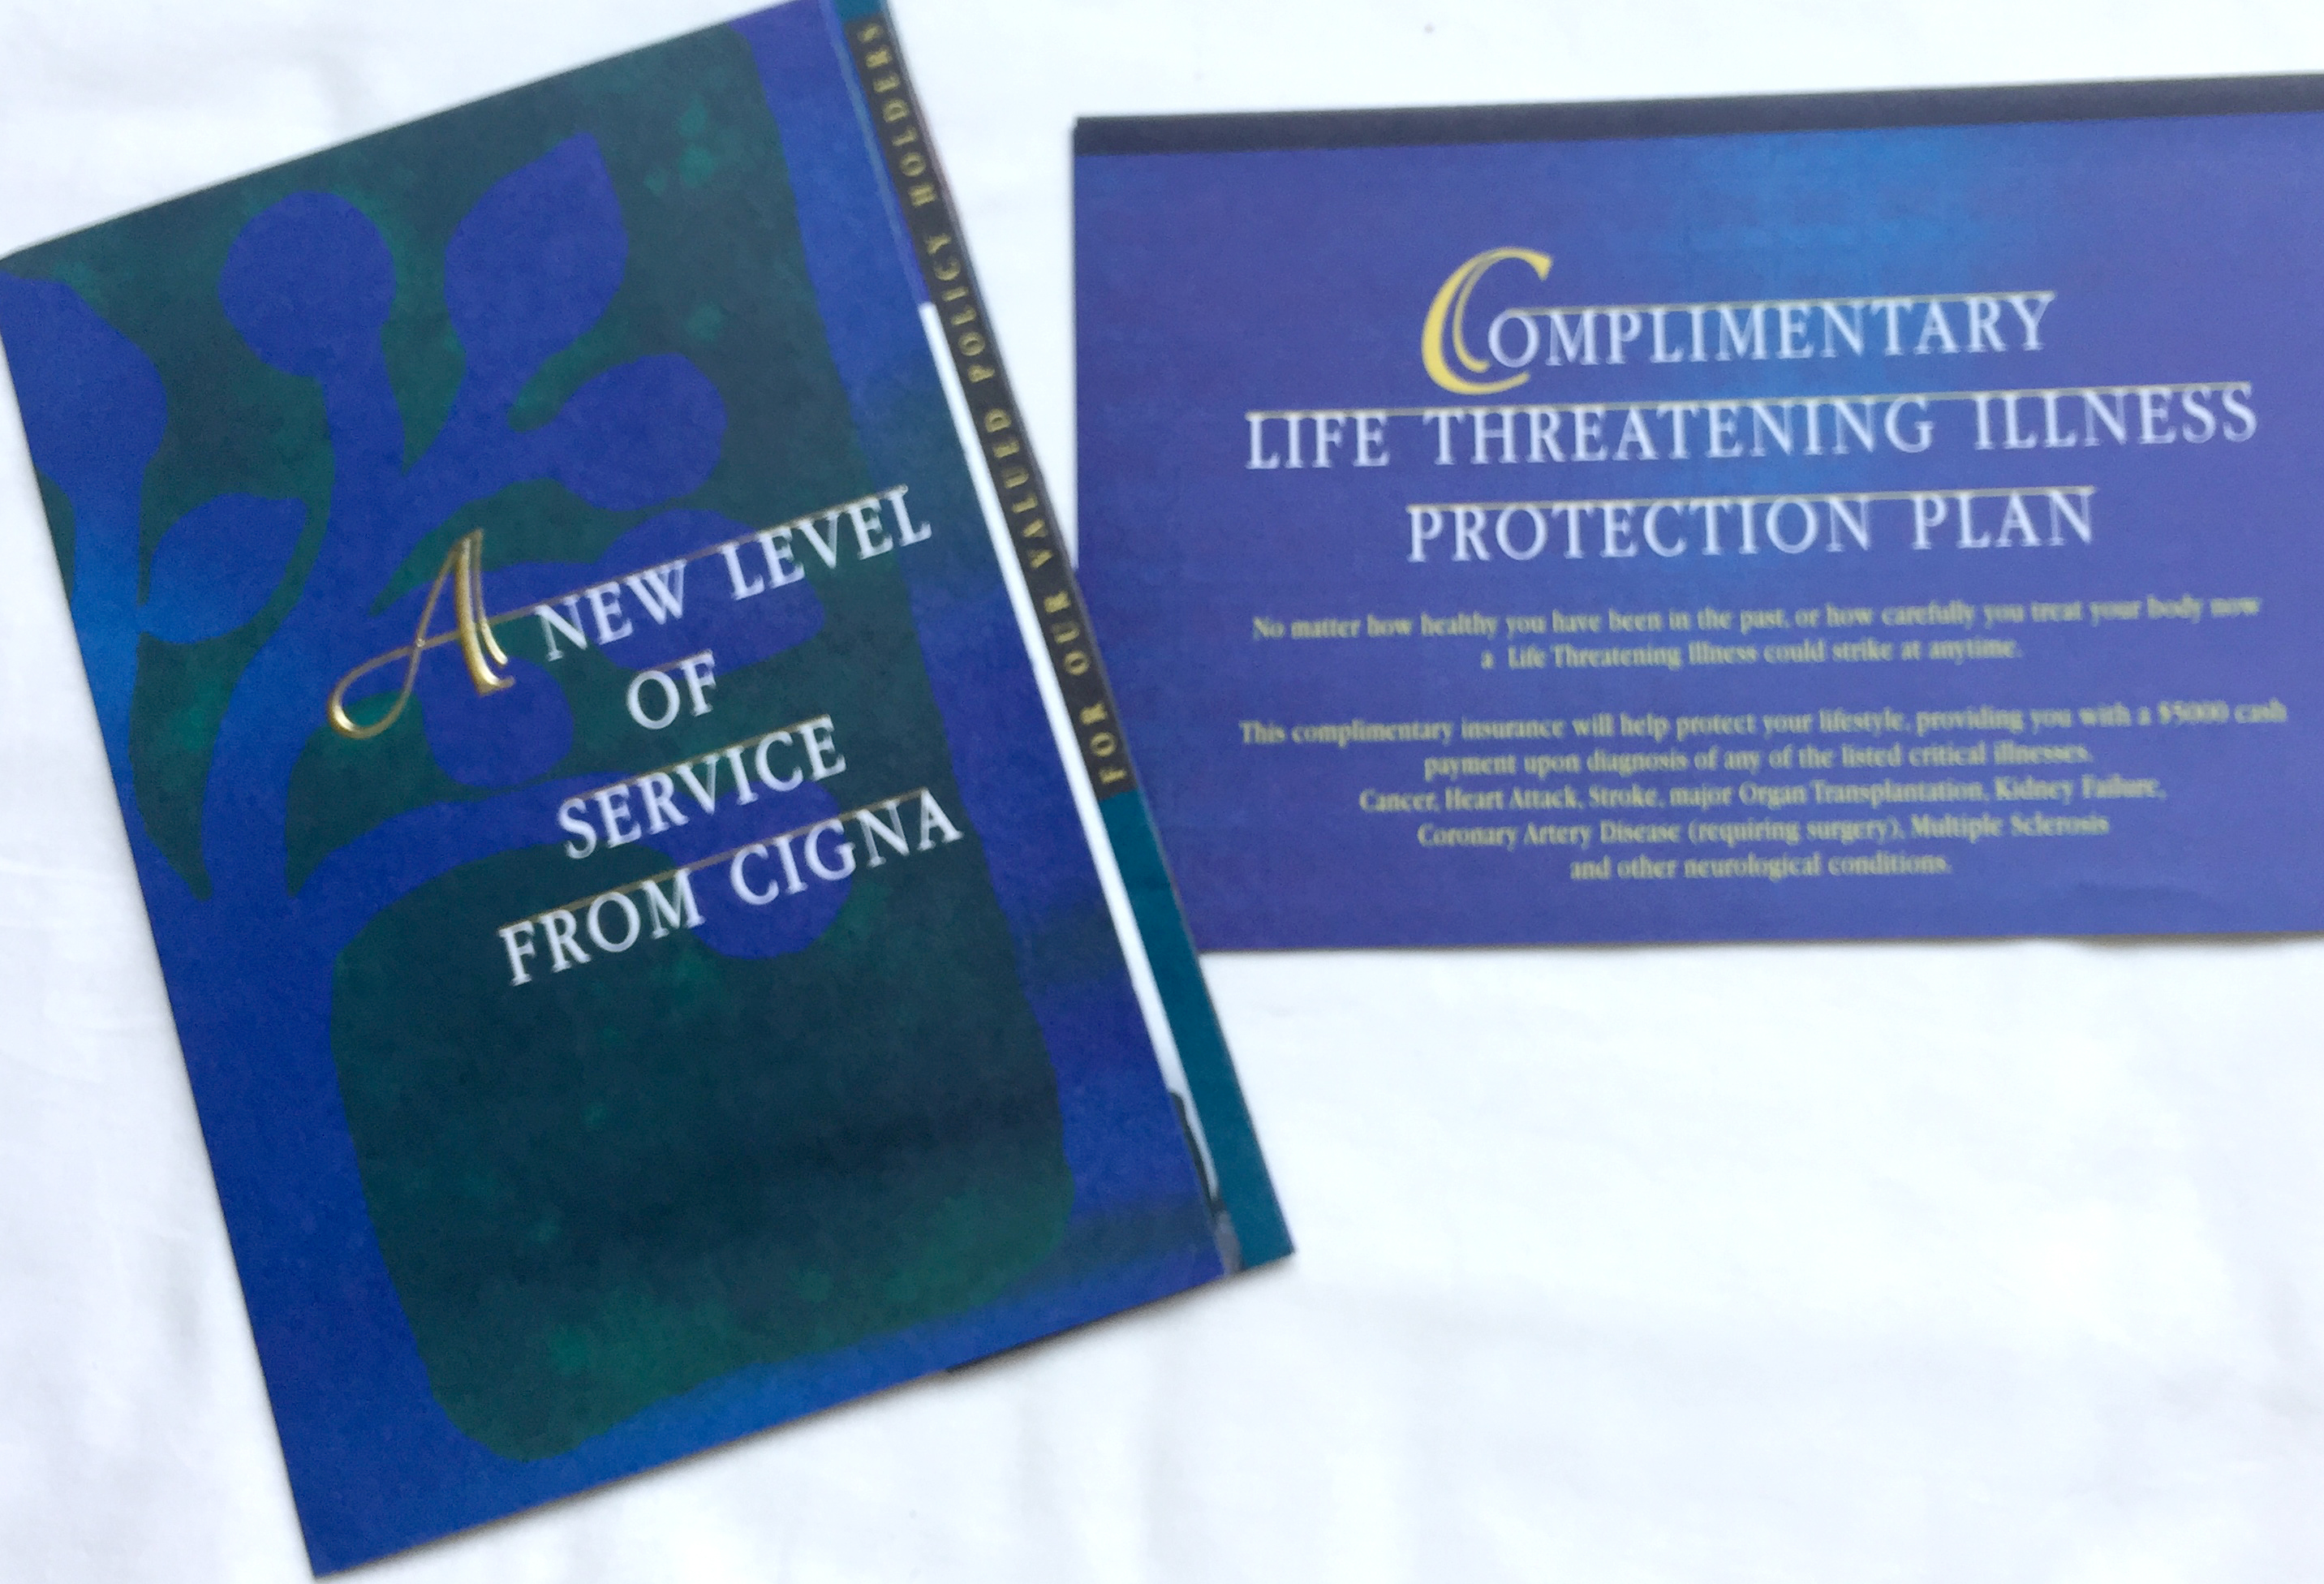 Cigna Insurance - Direct Mail